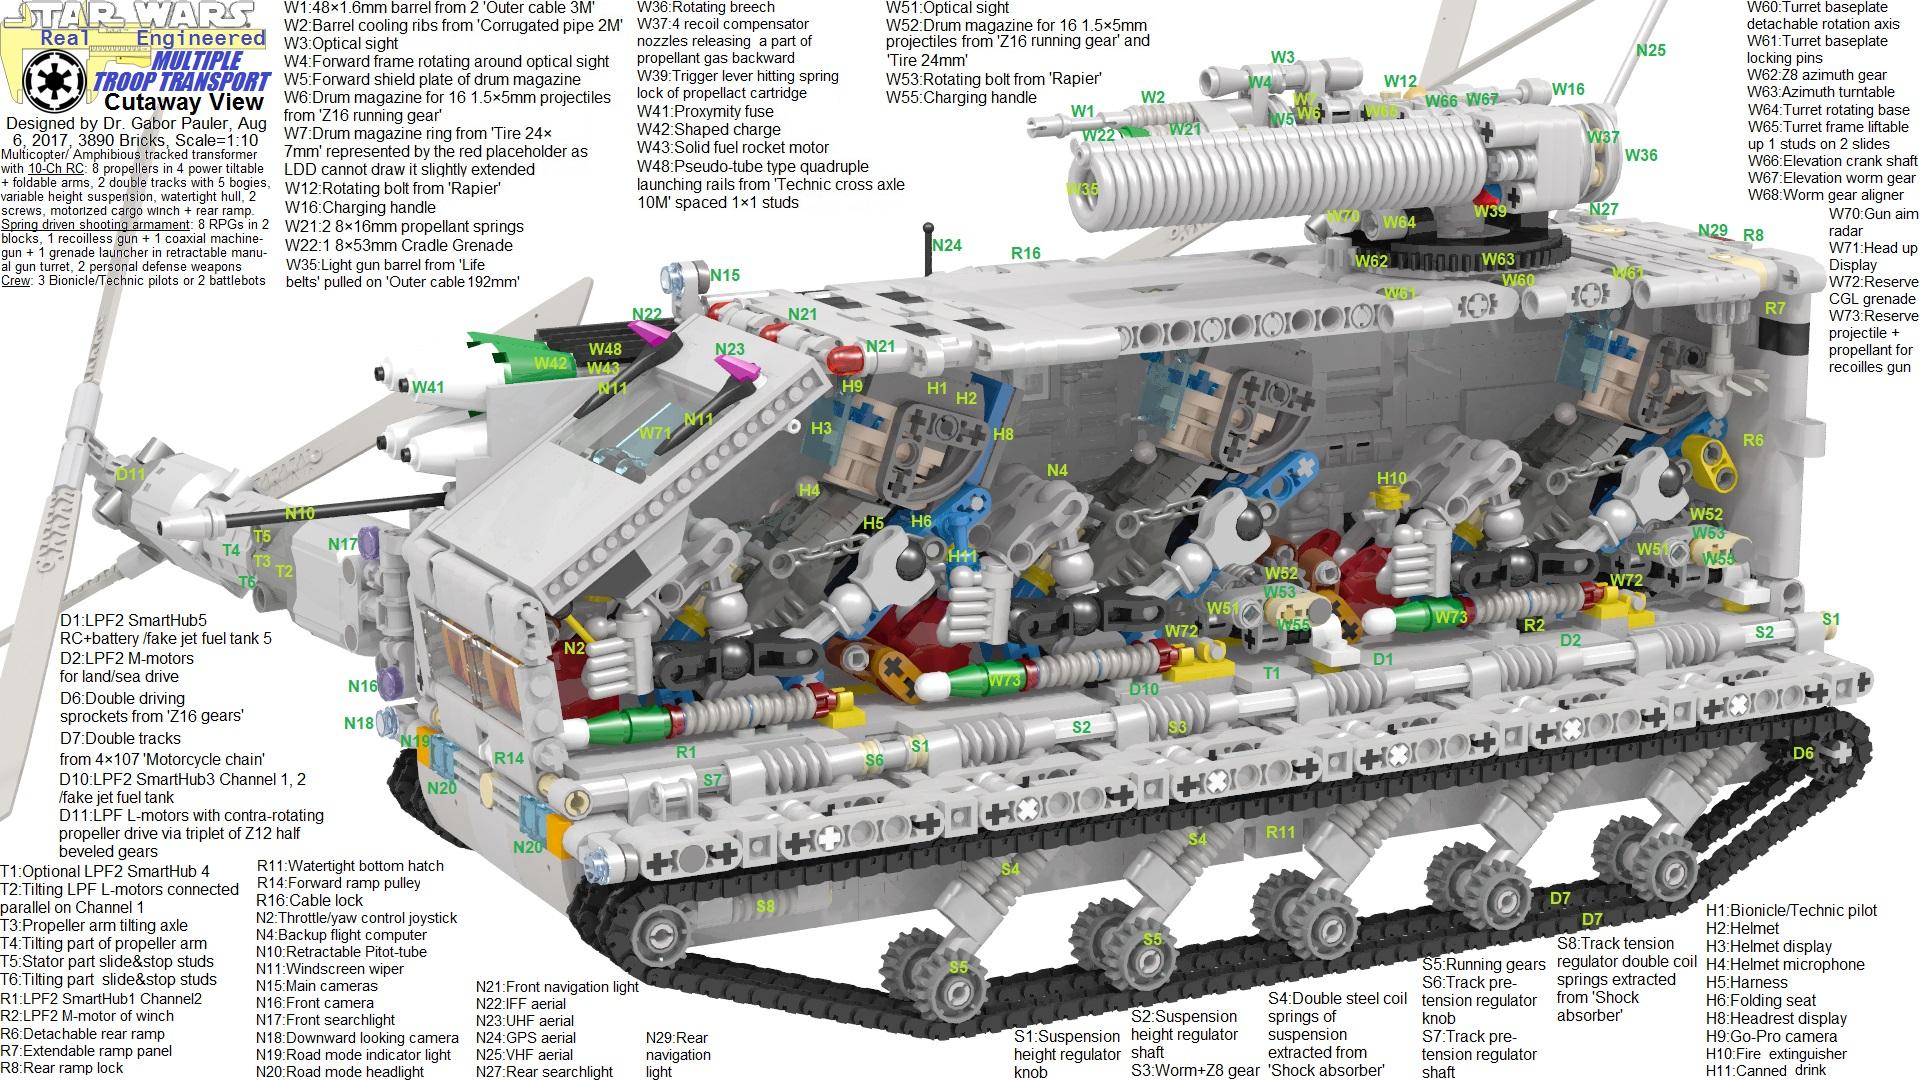 Star Wars Real Engineered: Multiple Troop Transport: A LEGO